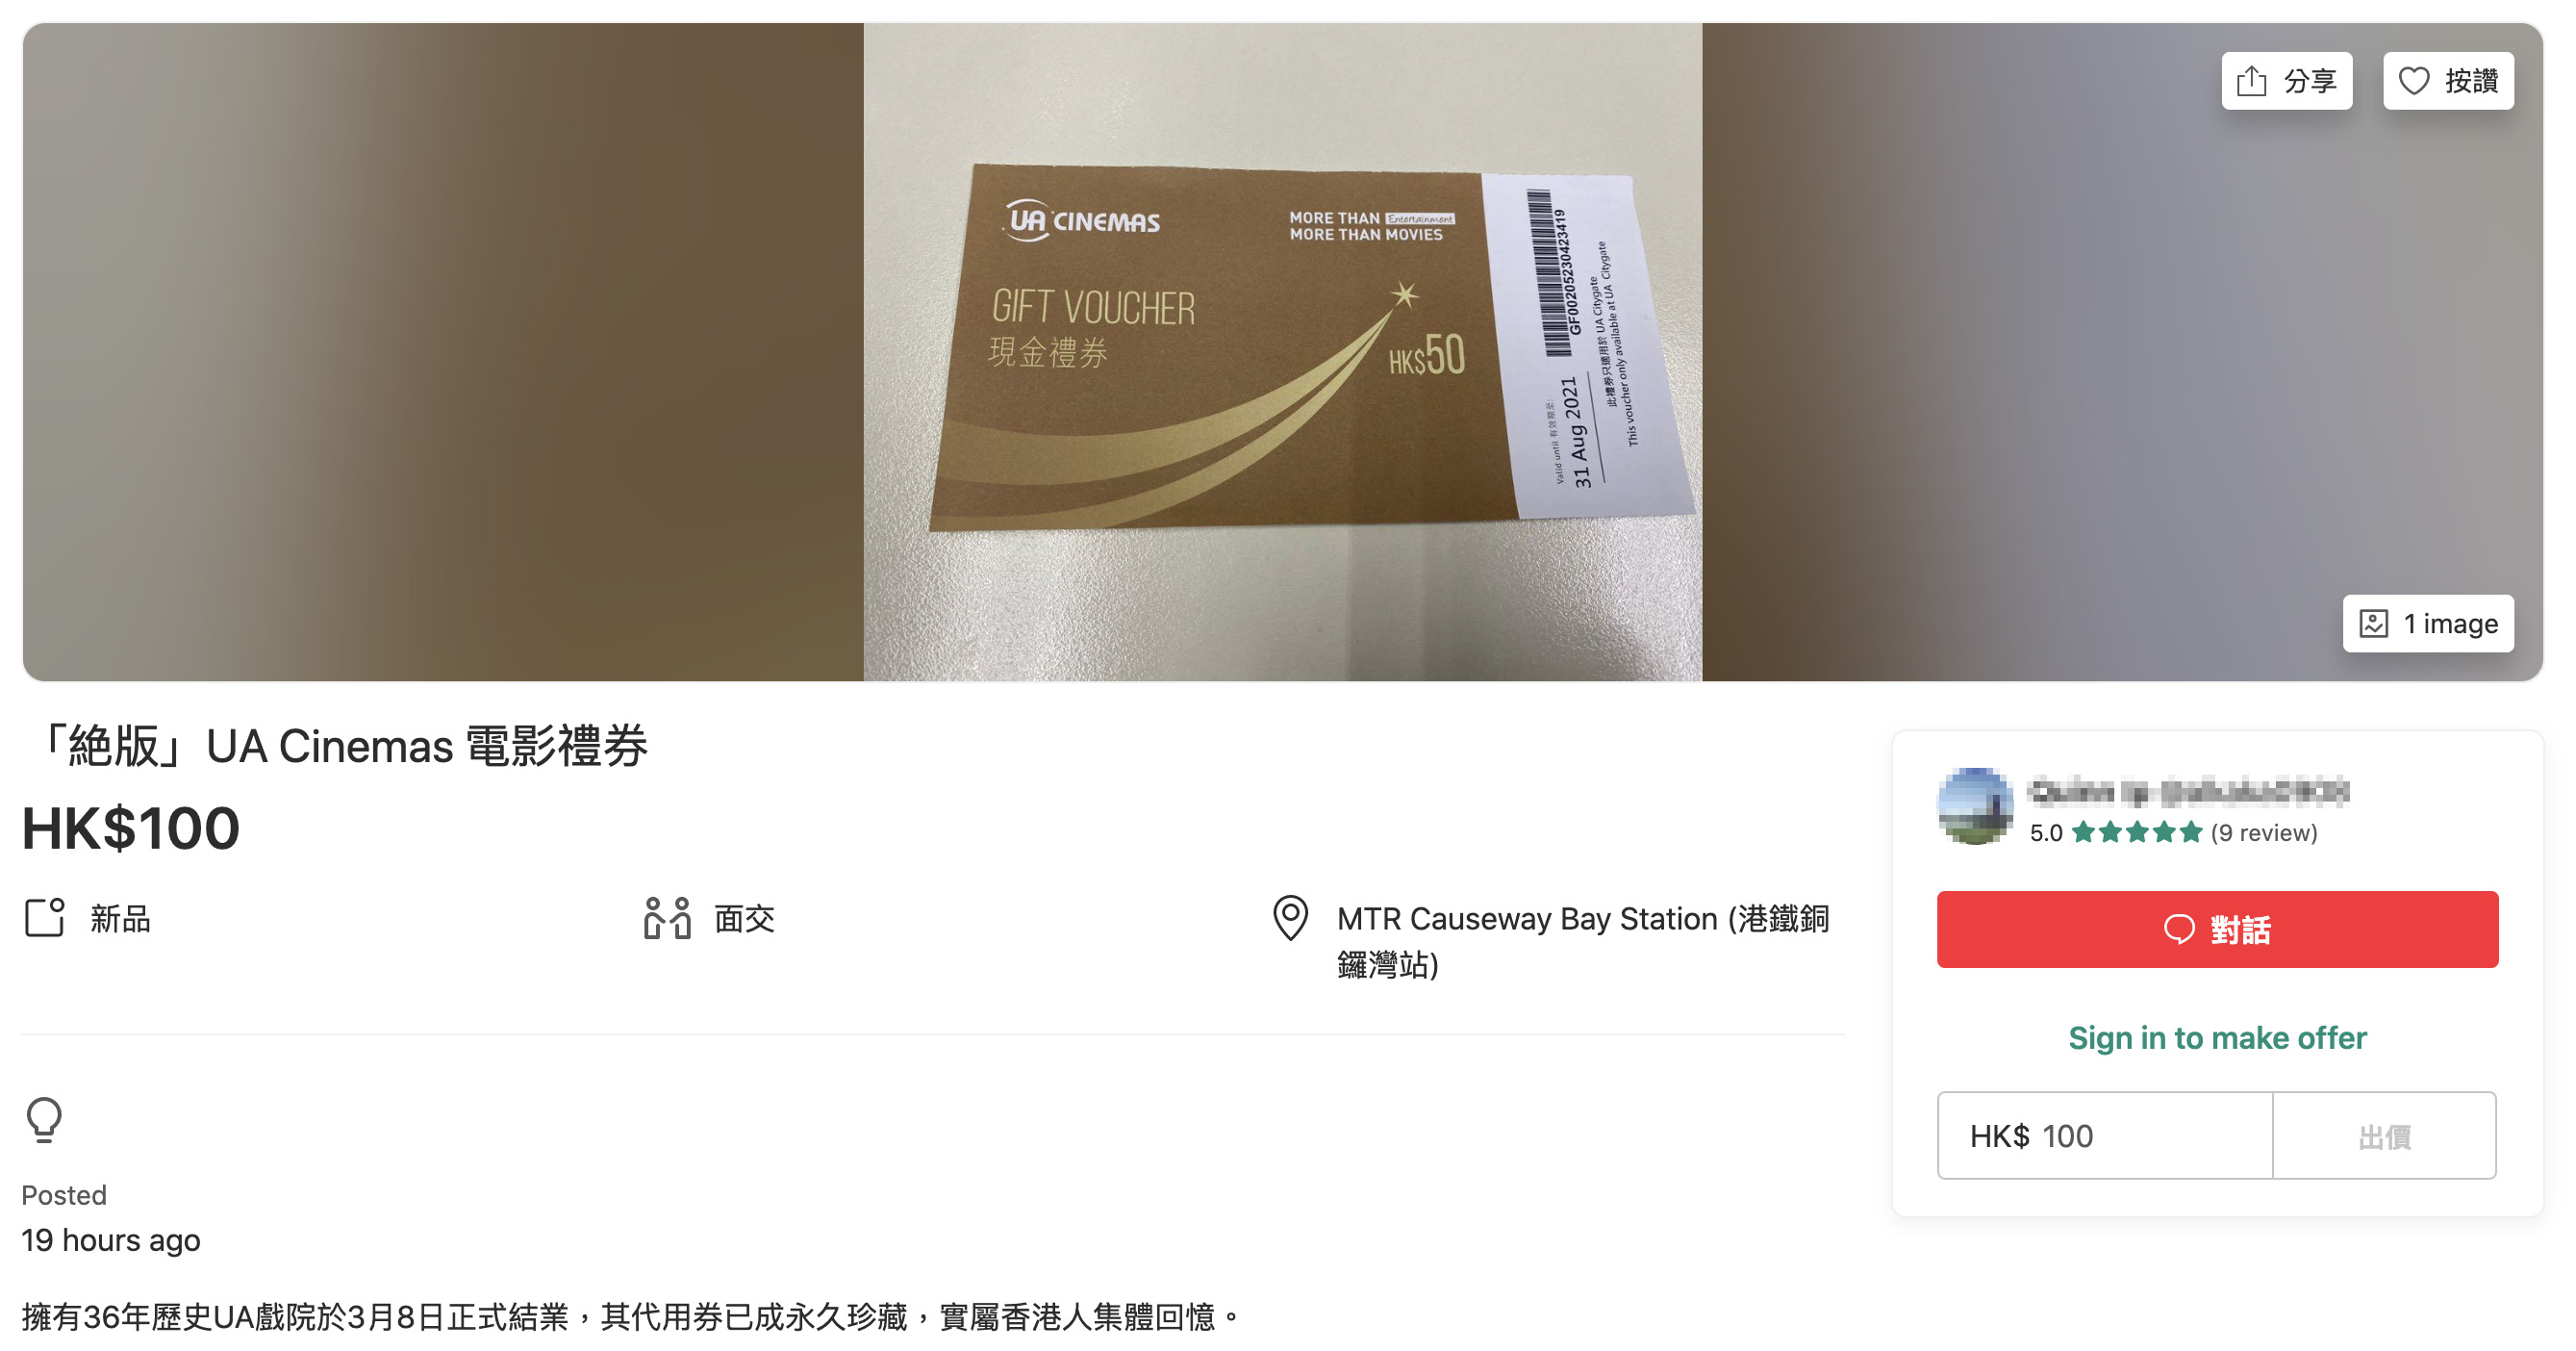 【UA停業】網友賣「絕版」現金劵 炒到$550張真係有人買?